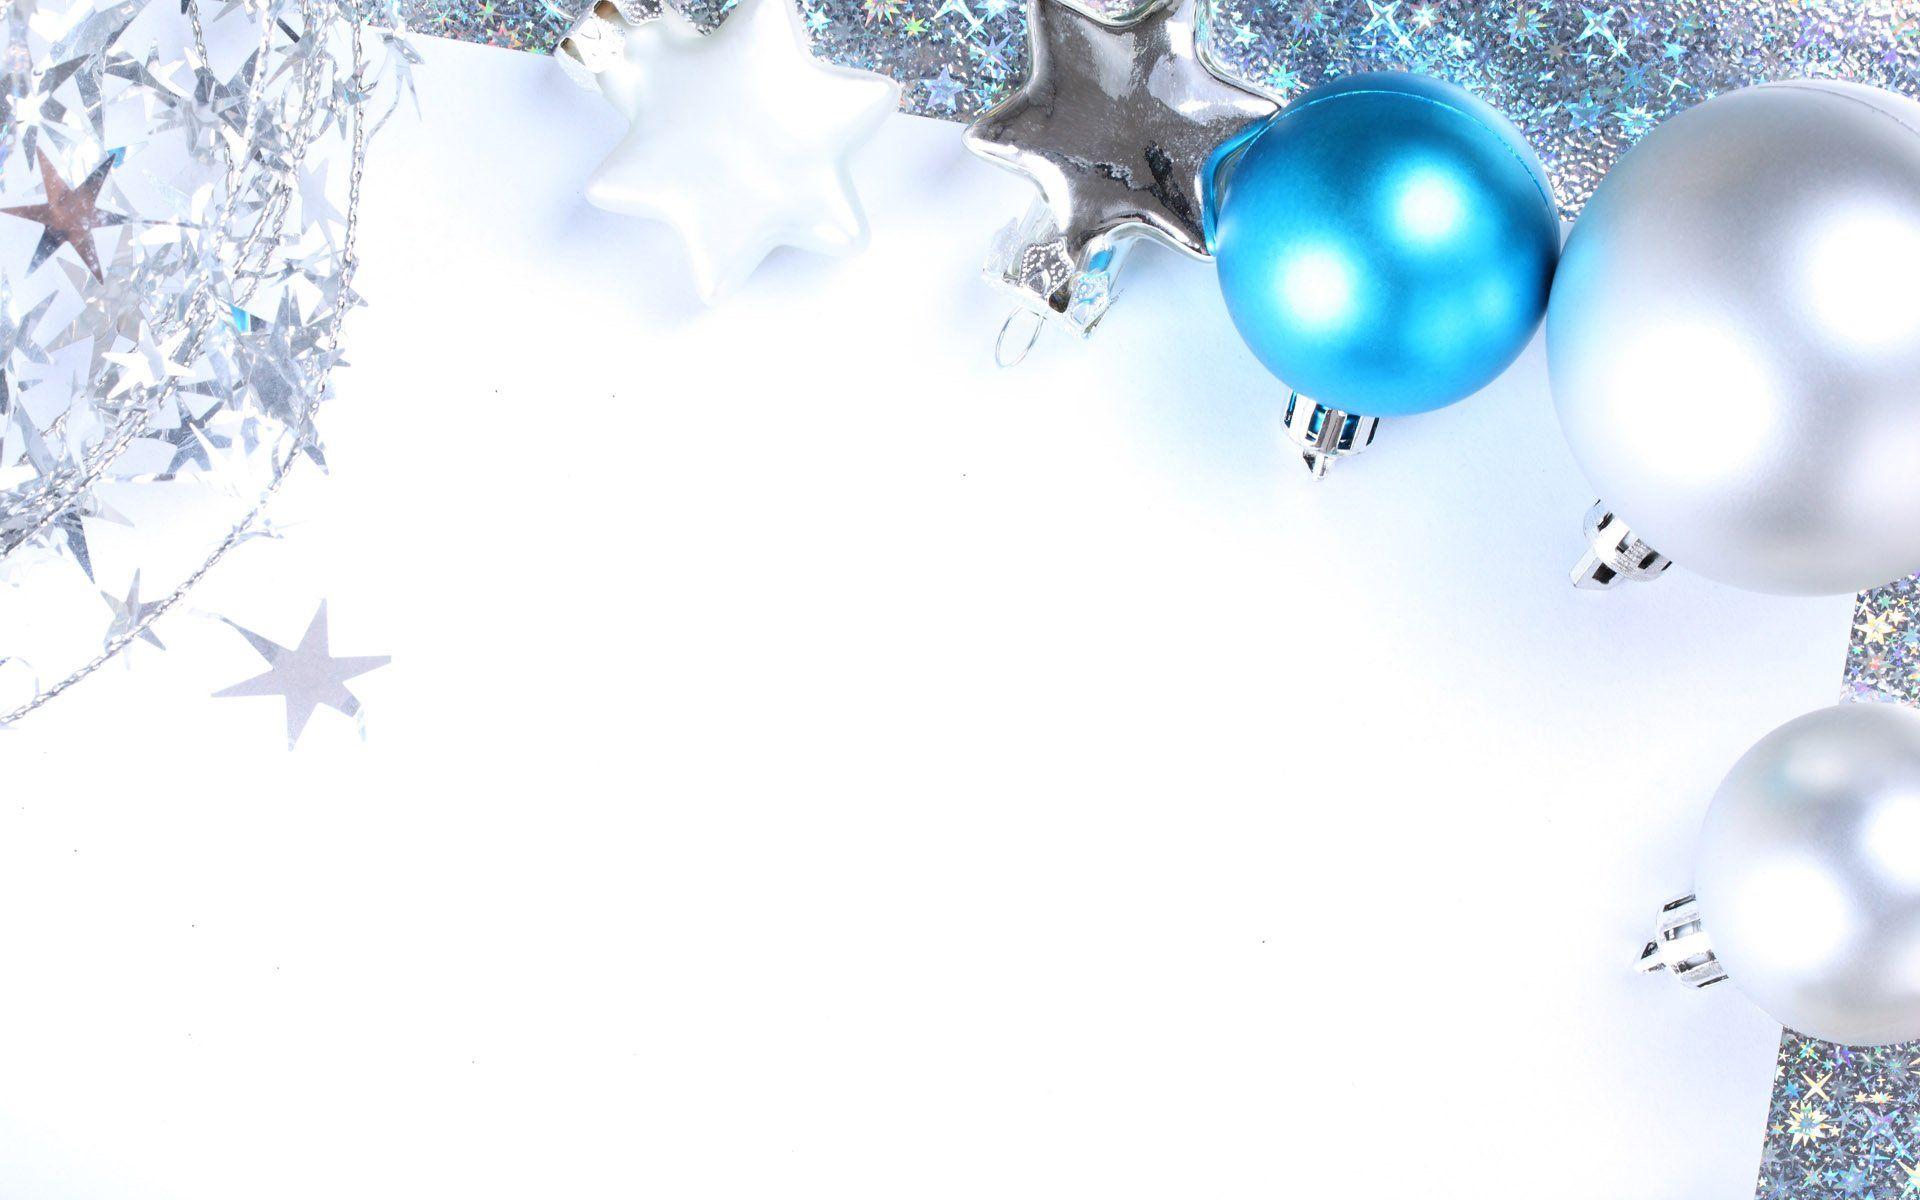 Blue Christmas Desktop Wallpaper Christmas Wallpaper Backgrounds Christmas Wallpaper White Christmas Background